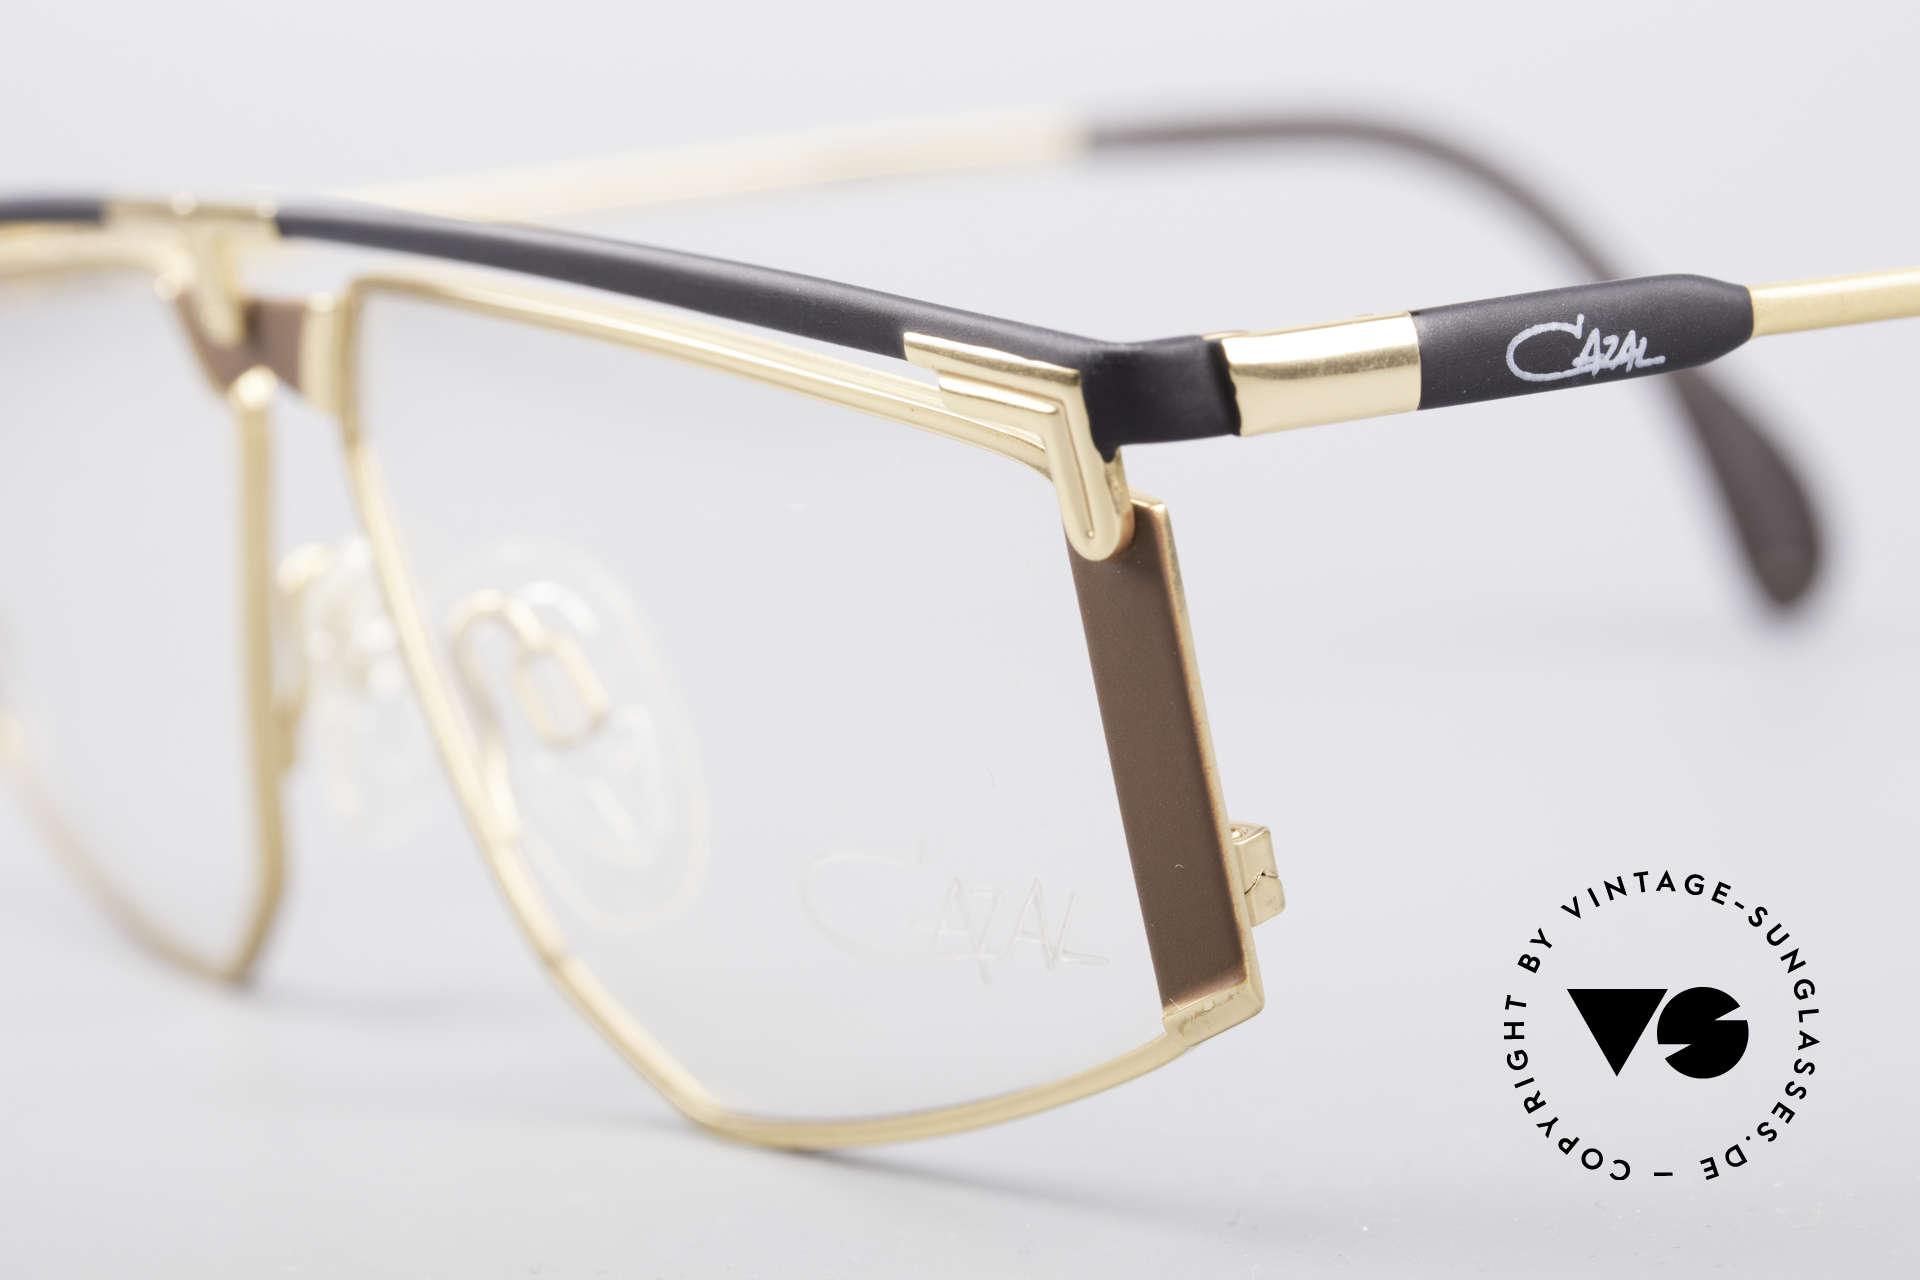 Cazal 235 Titanium Vintage Frame, unworn, NOS (like all our rare vintage Titanium specs), Made for Men and Women